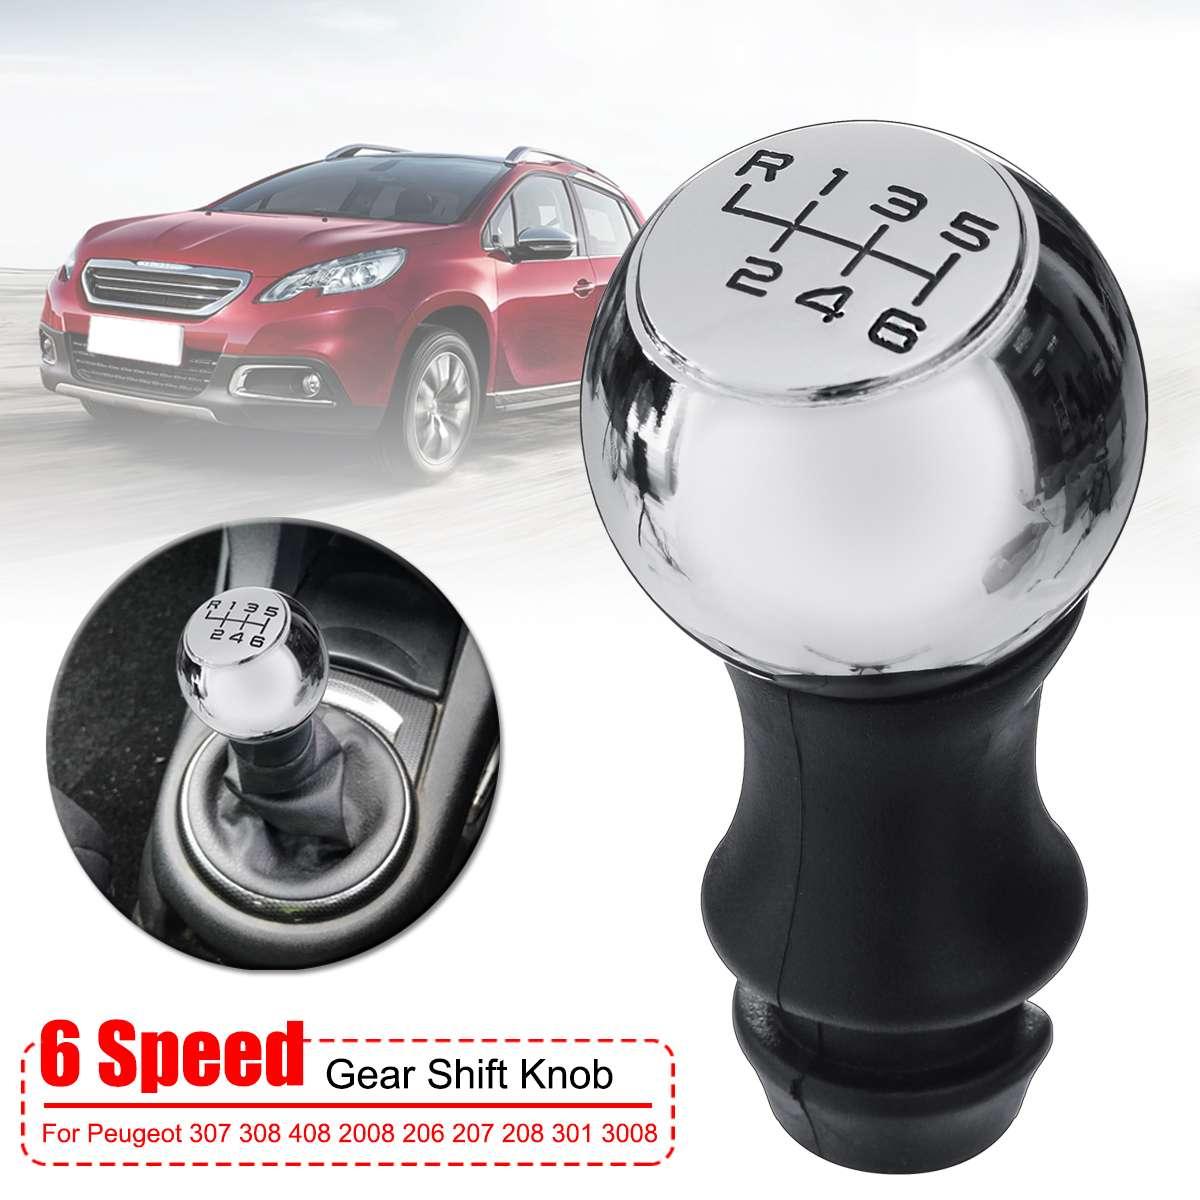 Proglam 5 Speed Alloy MT Gear Stick Shift Knob for Peugeot 106 206 207 307 308 406 408